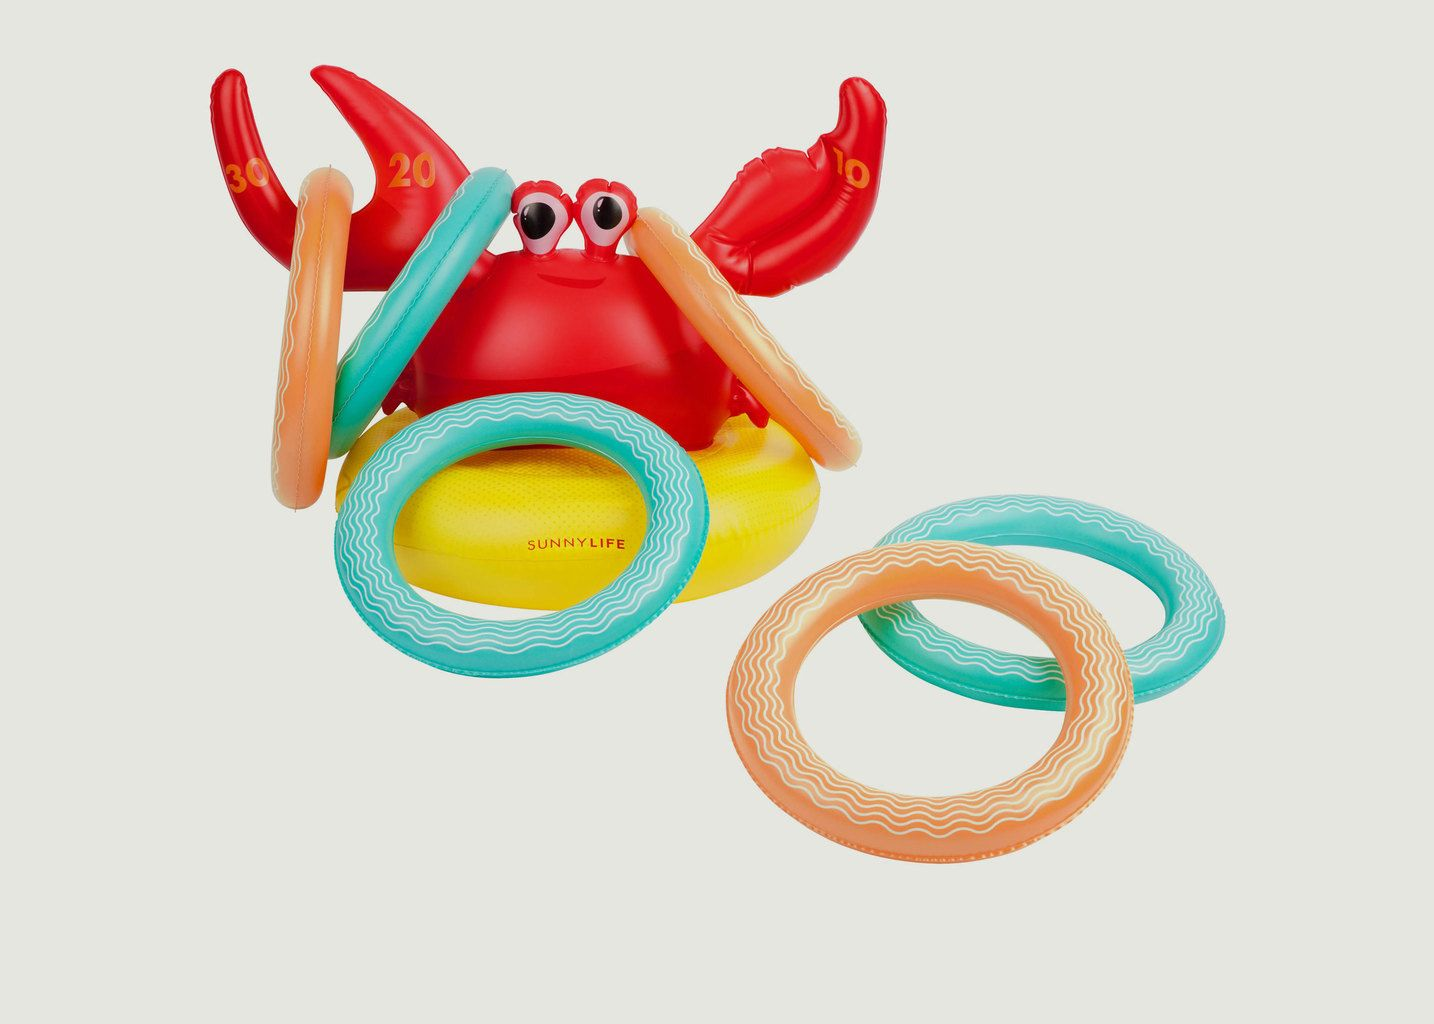 Jeu de Plage Crabe Gonflable - Sunny Life